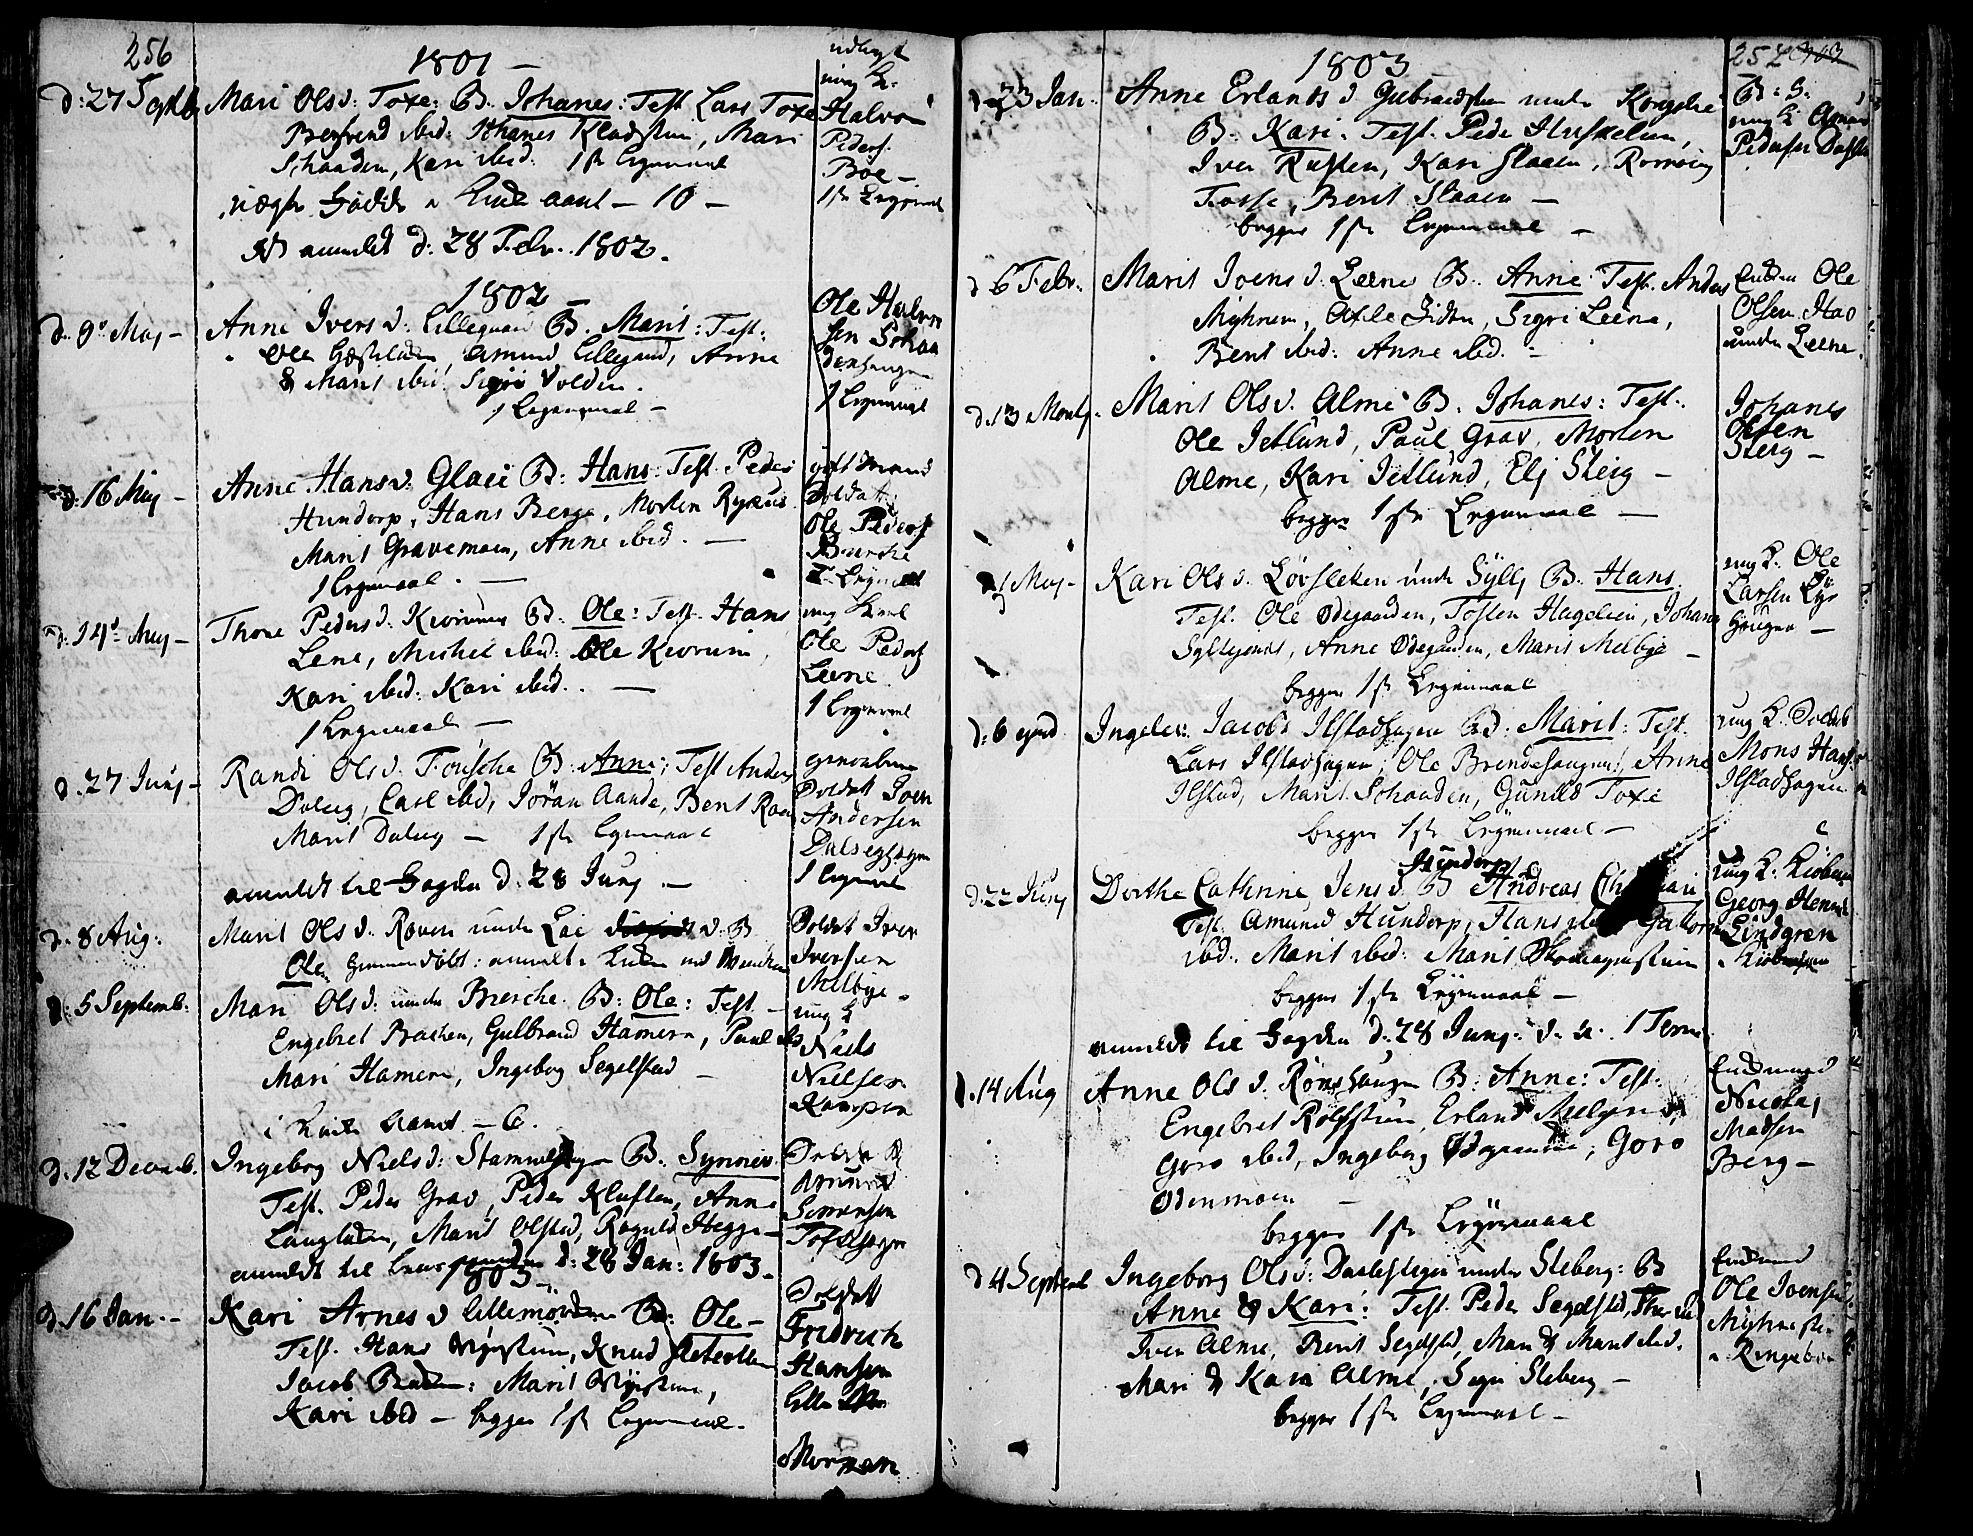 SAH, Fron prestekontor, H/Ha/Haa/L0001: Ministerialbok nr. 1, 1799-1816, s. 256-257